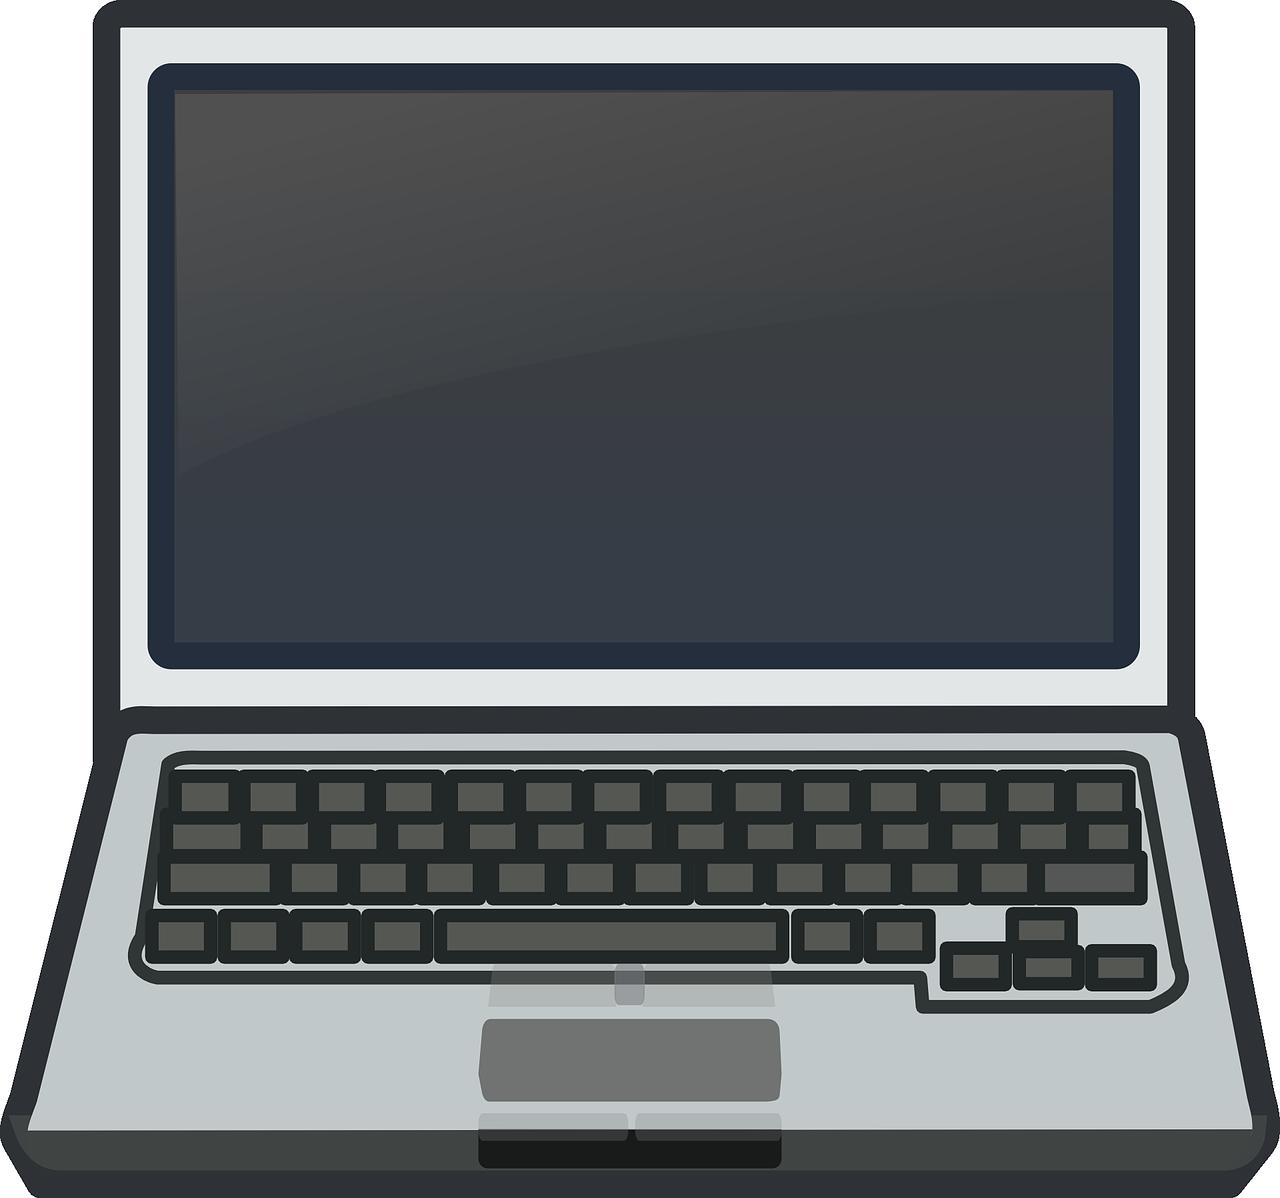 Free Laptop Clip Art